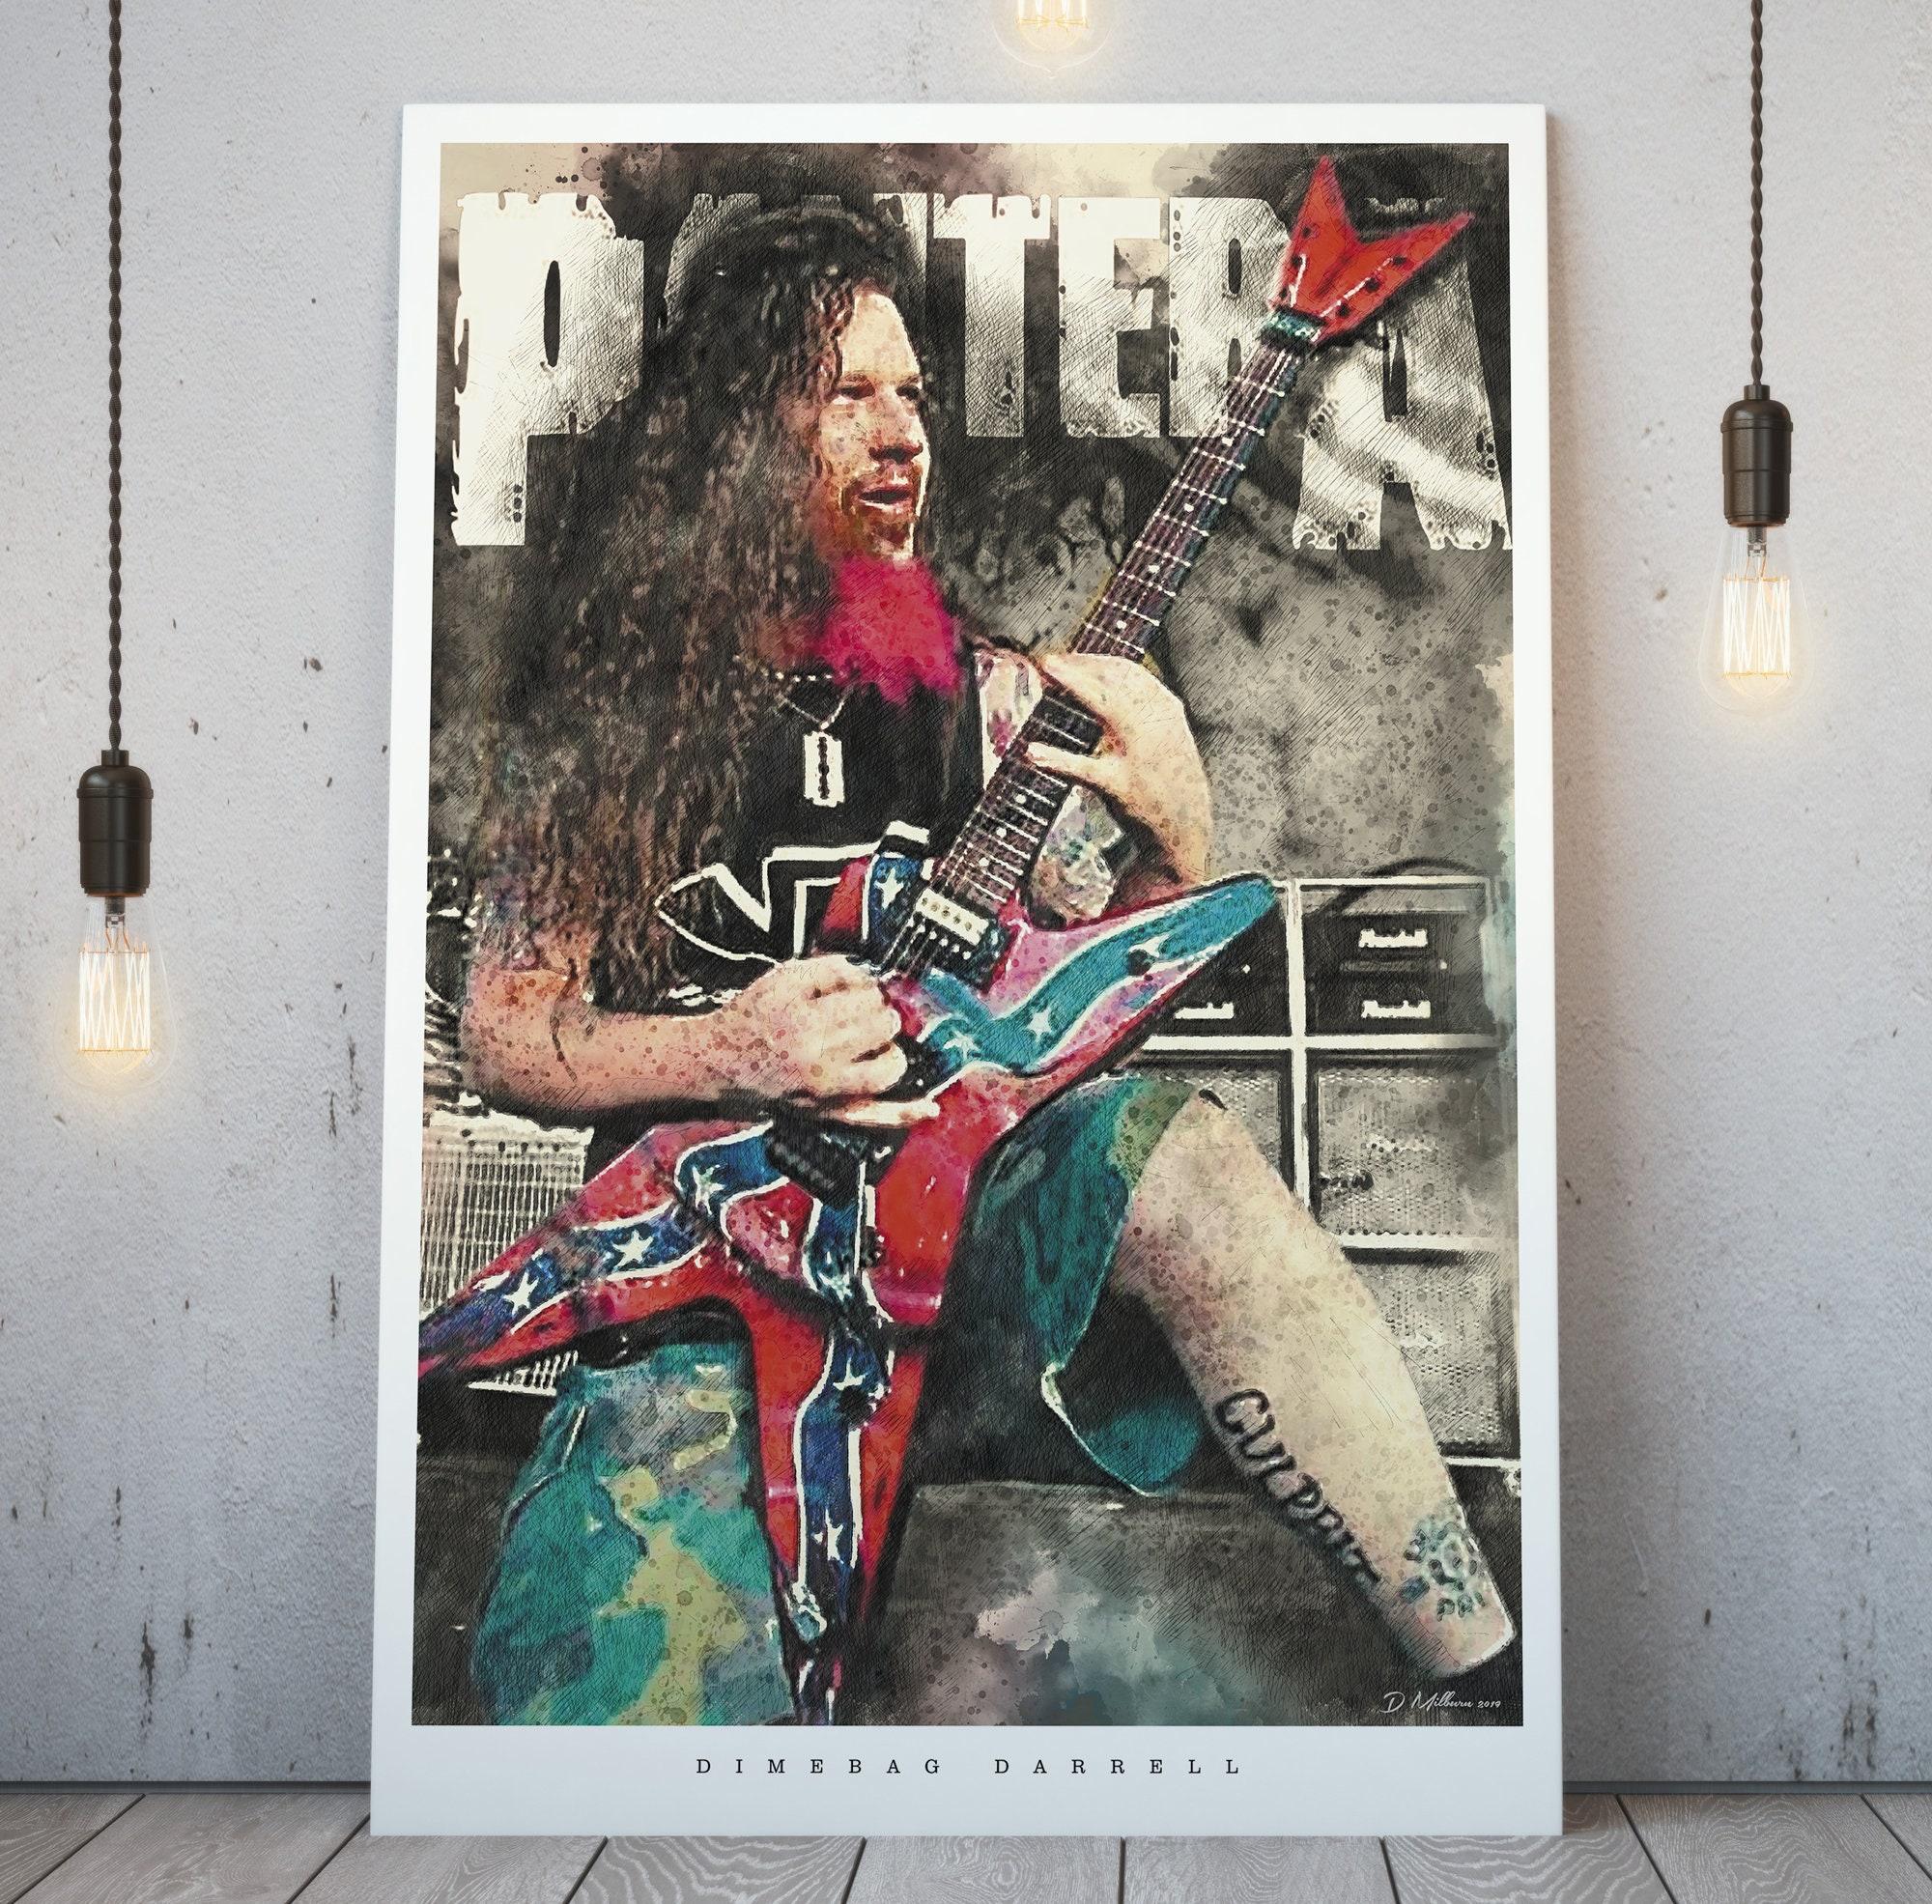 A4 A3 A2 A1 A0| Eric Clapton Digital Art Music Poster Print T1346